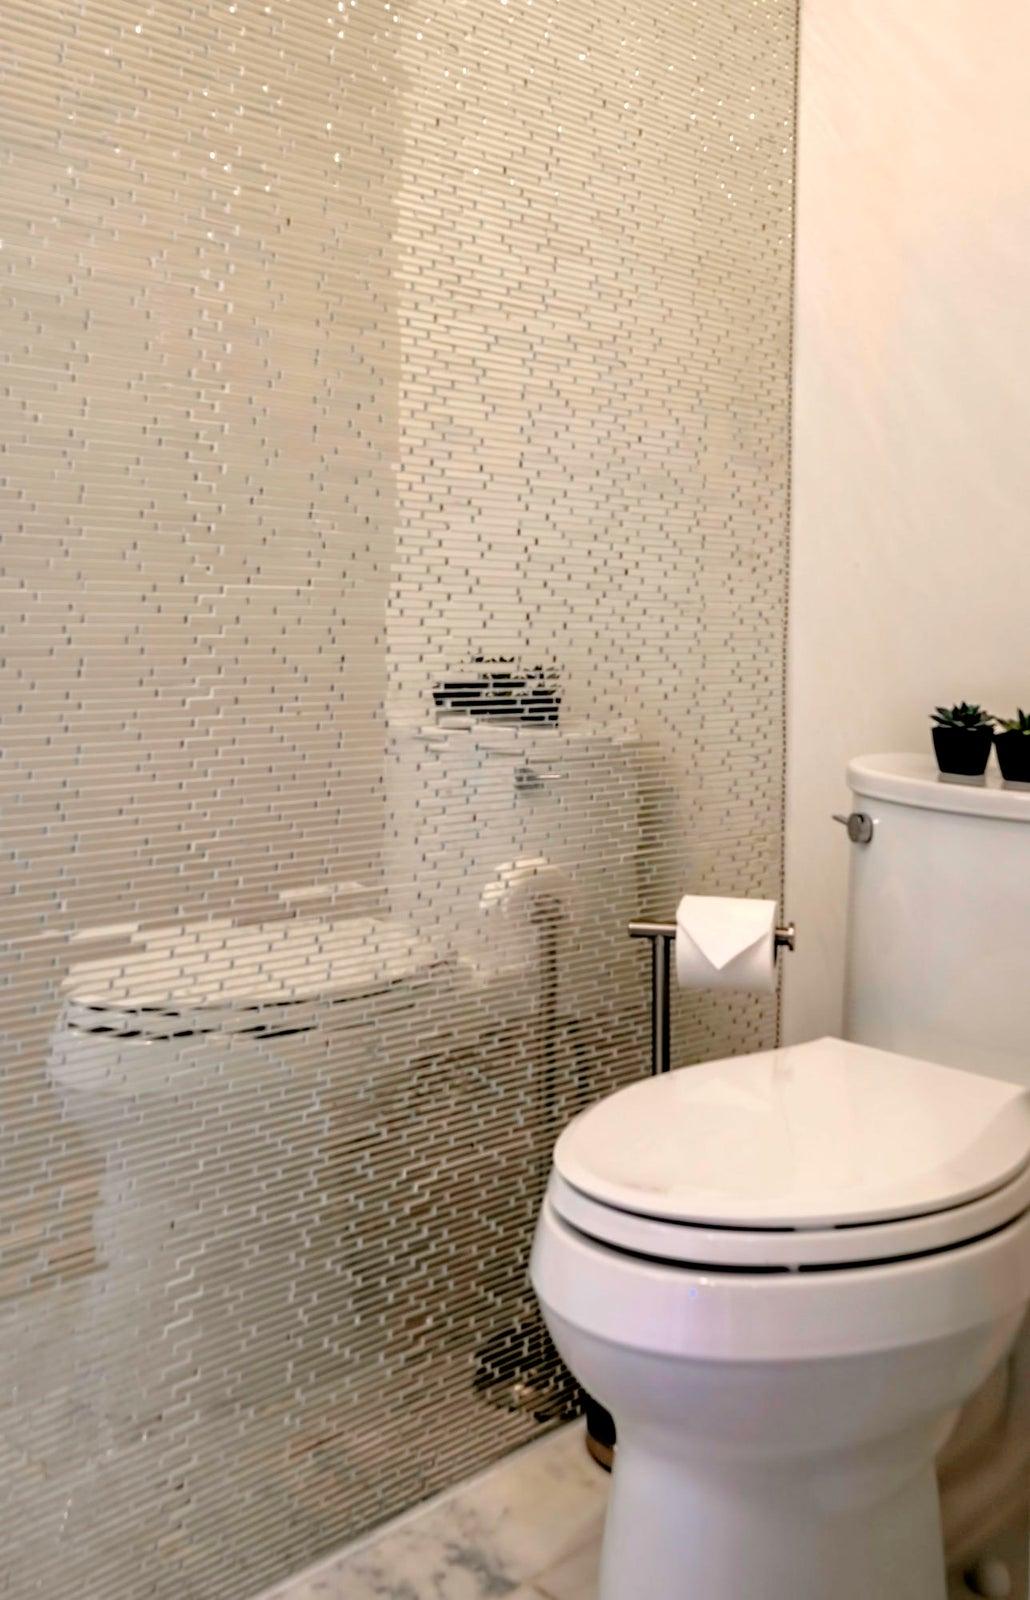 DSC_1947-HDR Glamour Half Bath